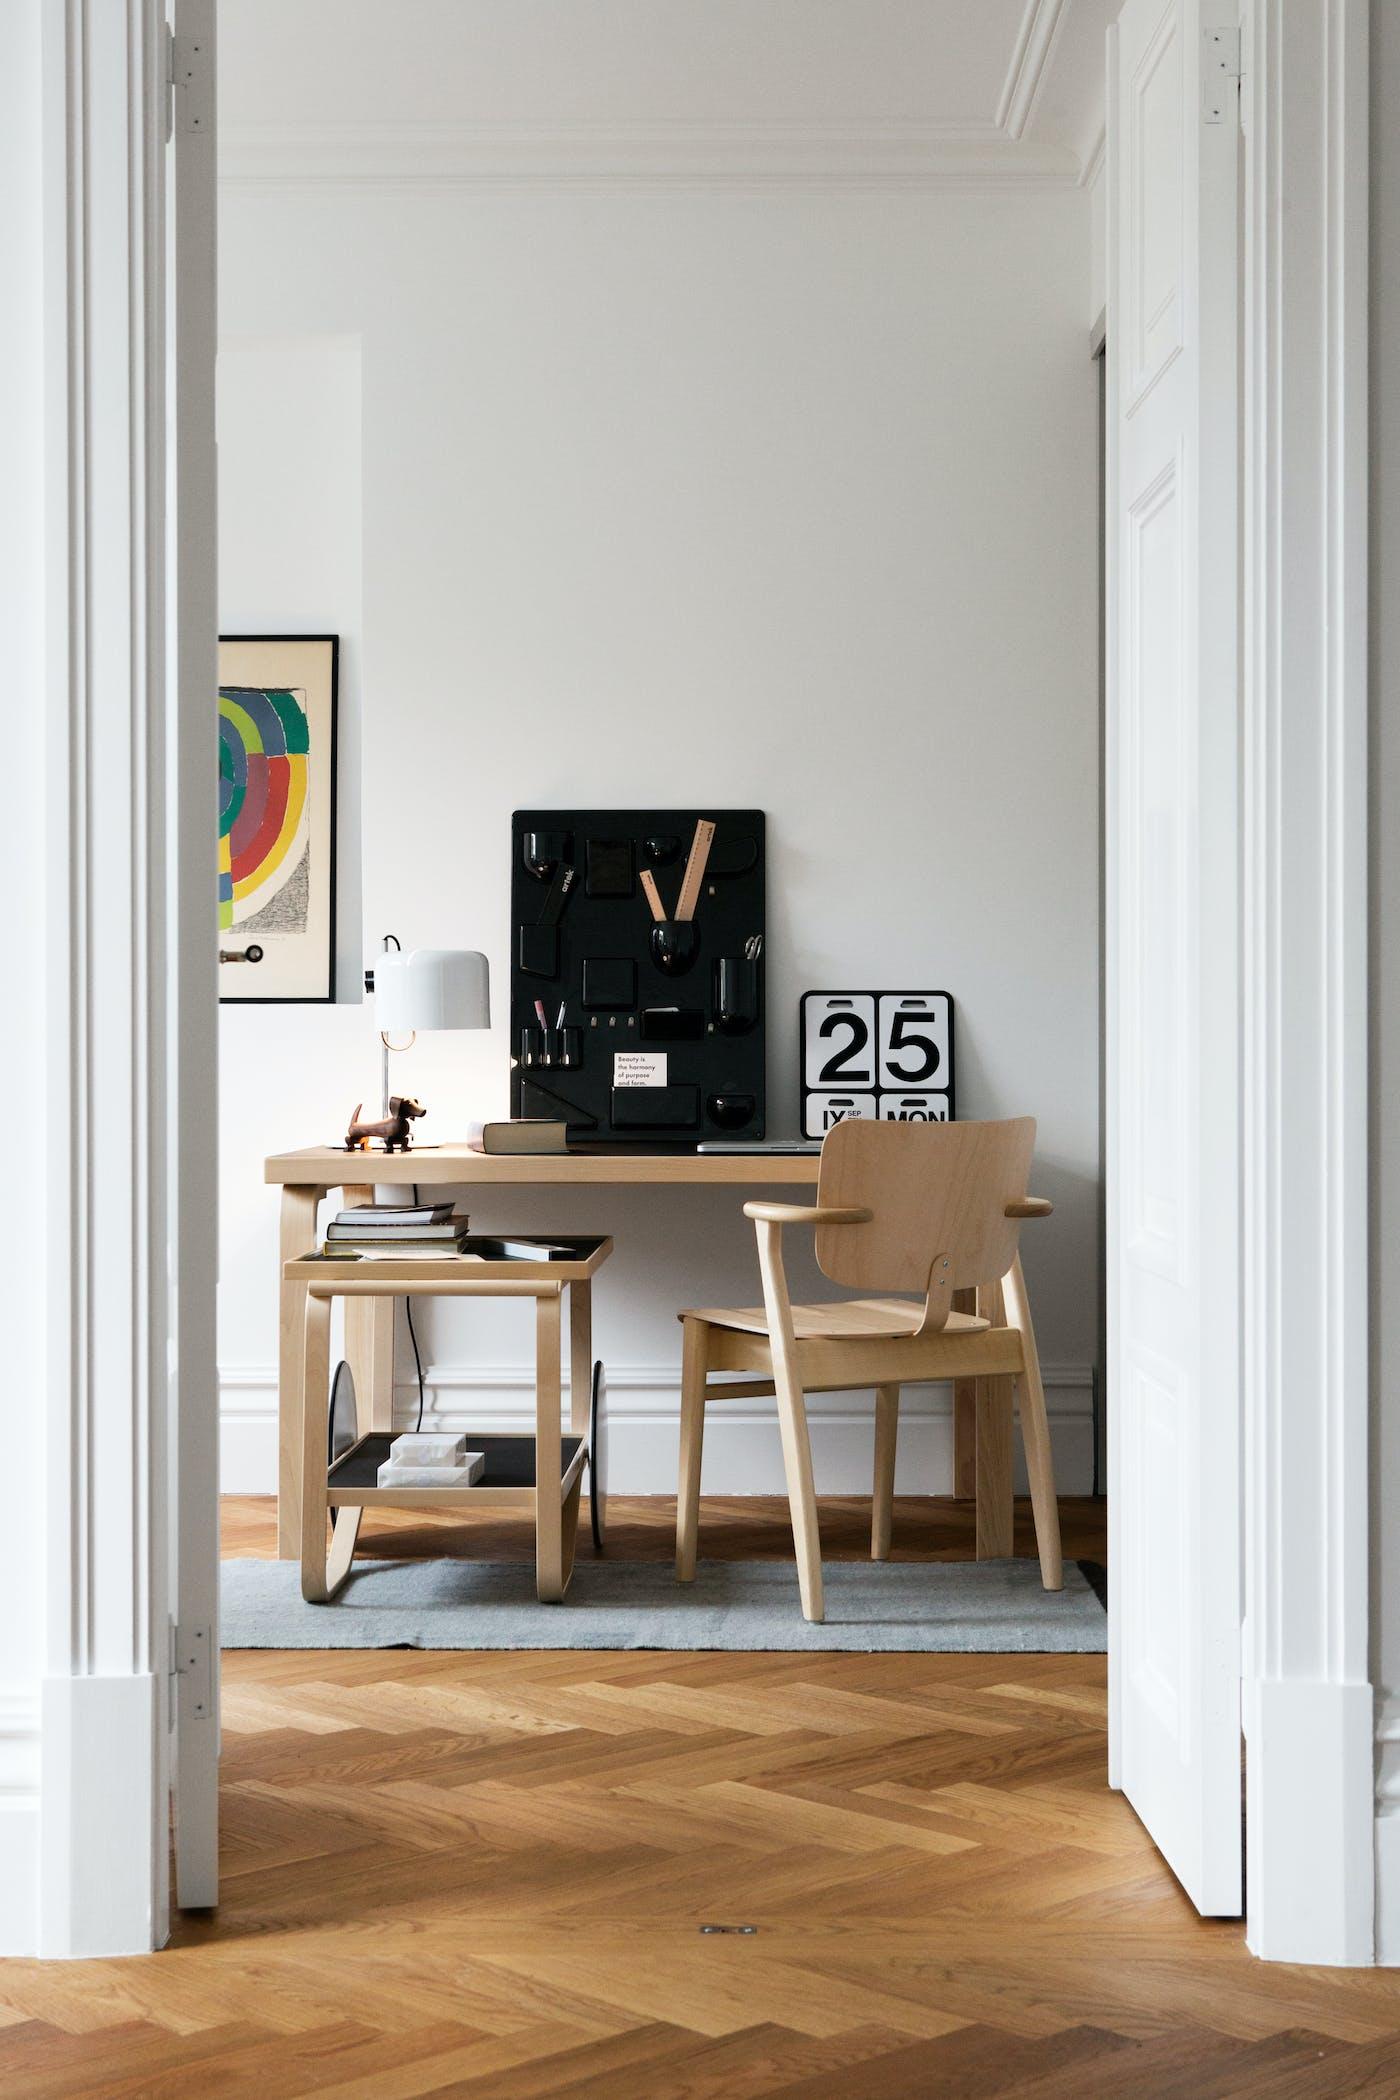 1835176 Aalto Table rectangular 80 A Domus Chair Tea Trolley 901 master